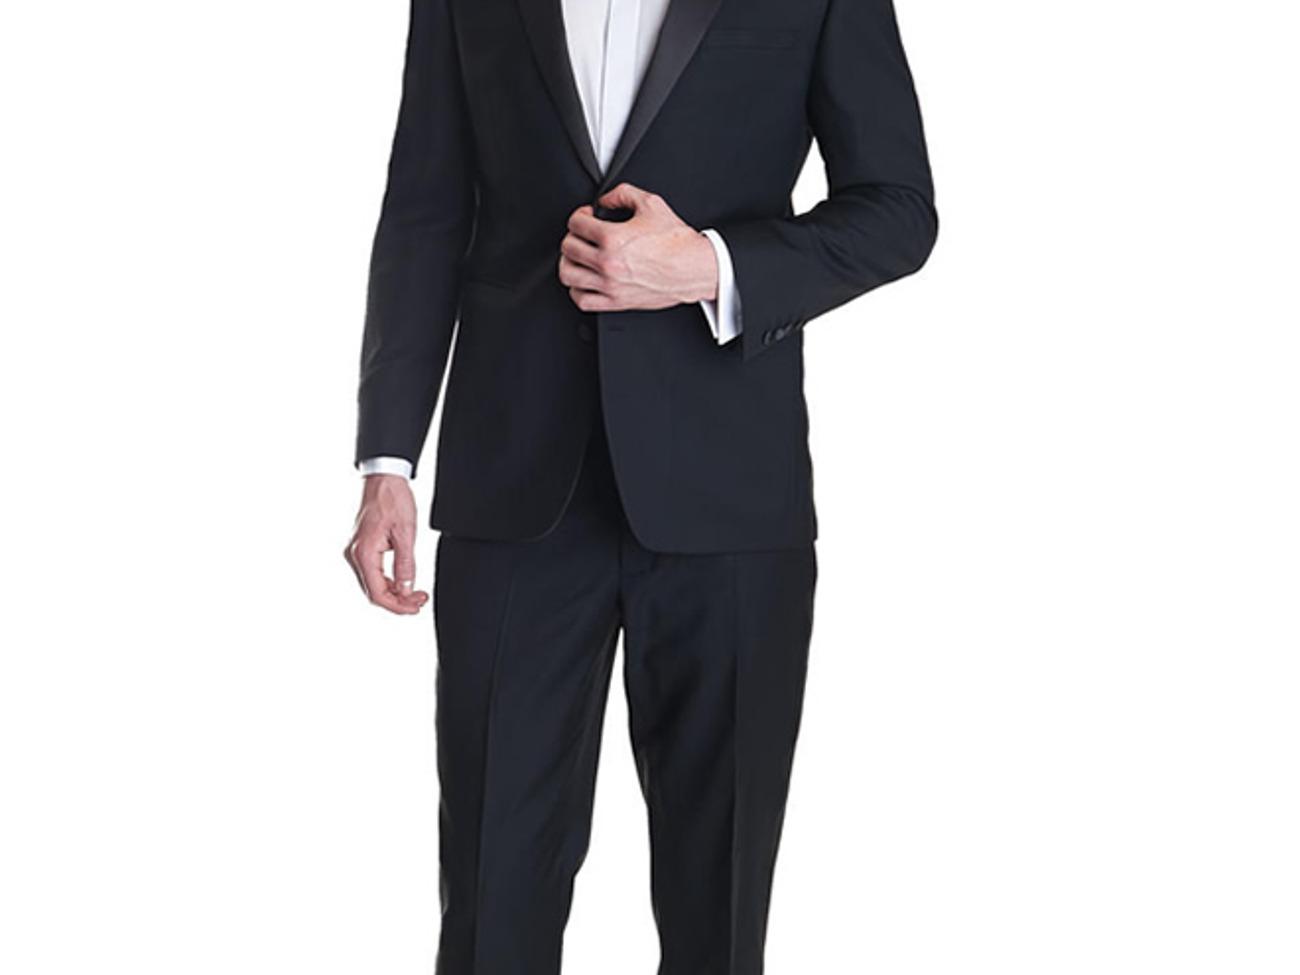 Rent Pierre Cardin Dinner Suit Jacket 38 Reg Trousers 32 Reg In Bexleyheath Rent For 1 00 Day